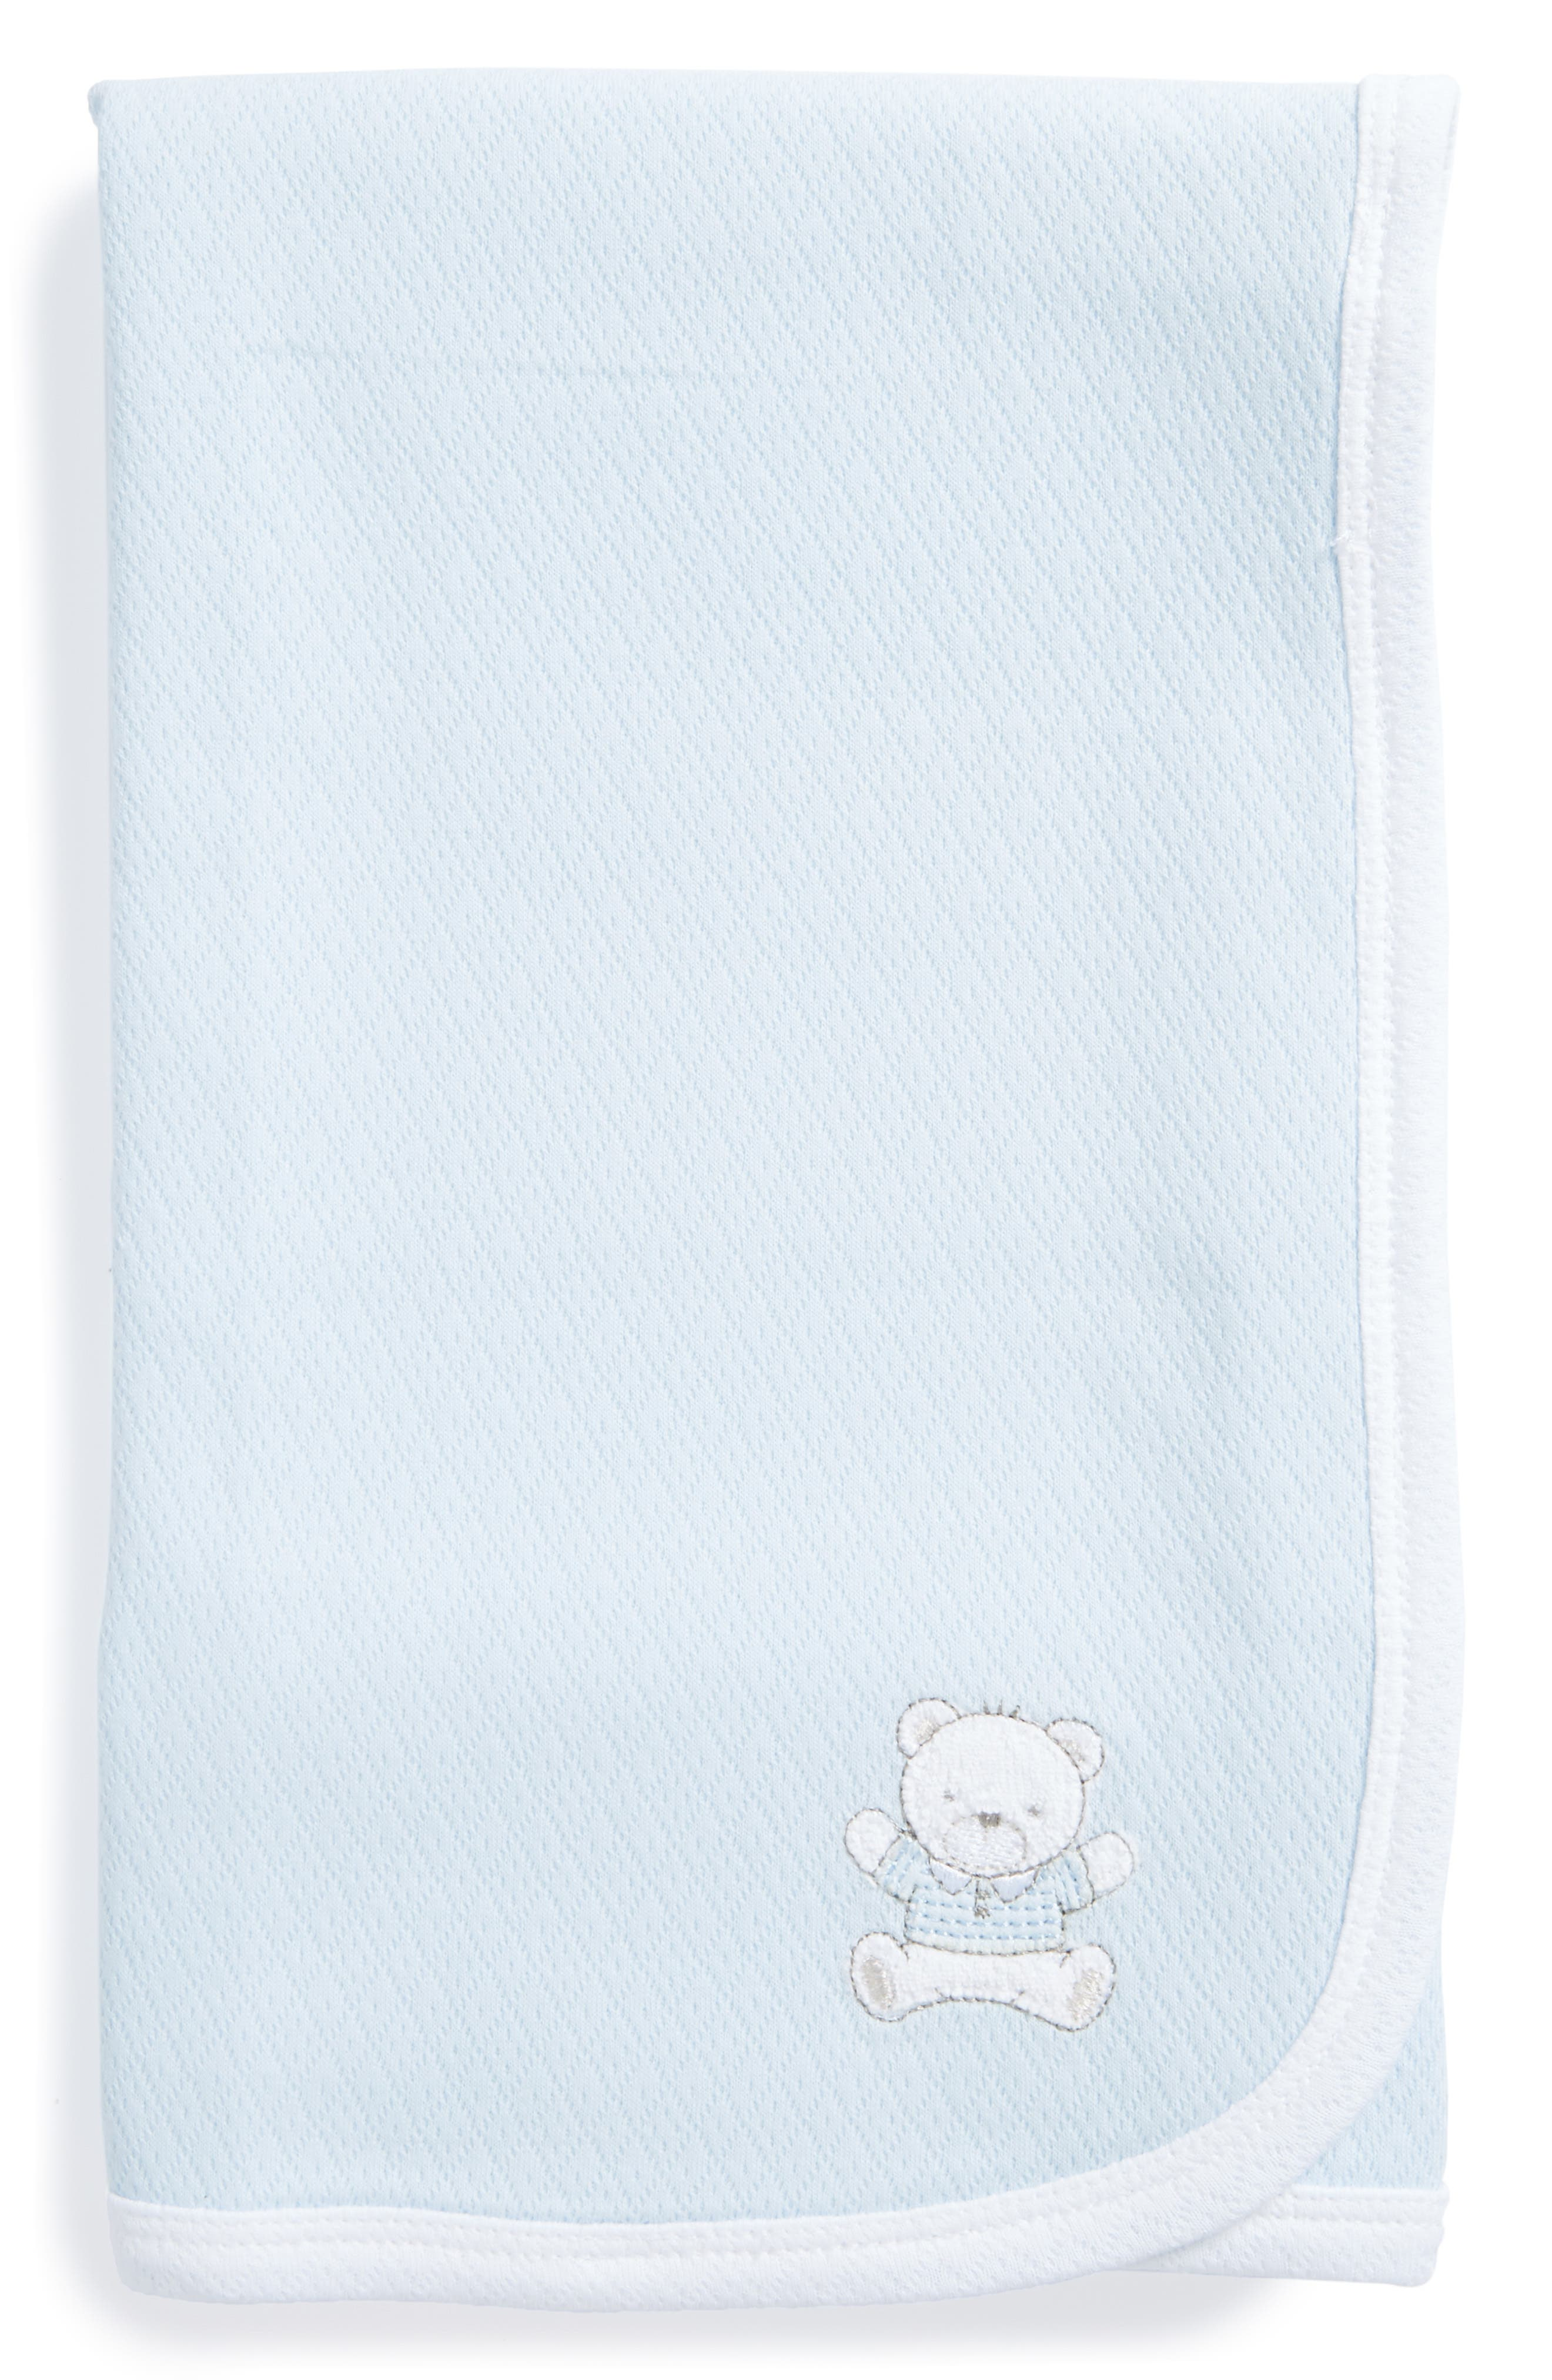 Alternate Image 1 Selected - Little Me Bear Receiving Blanket (Nordstrom Exclusive)